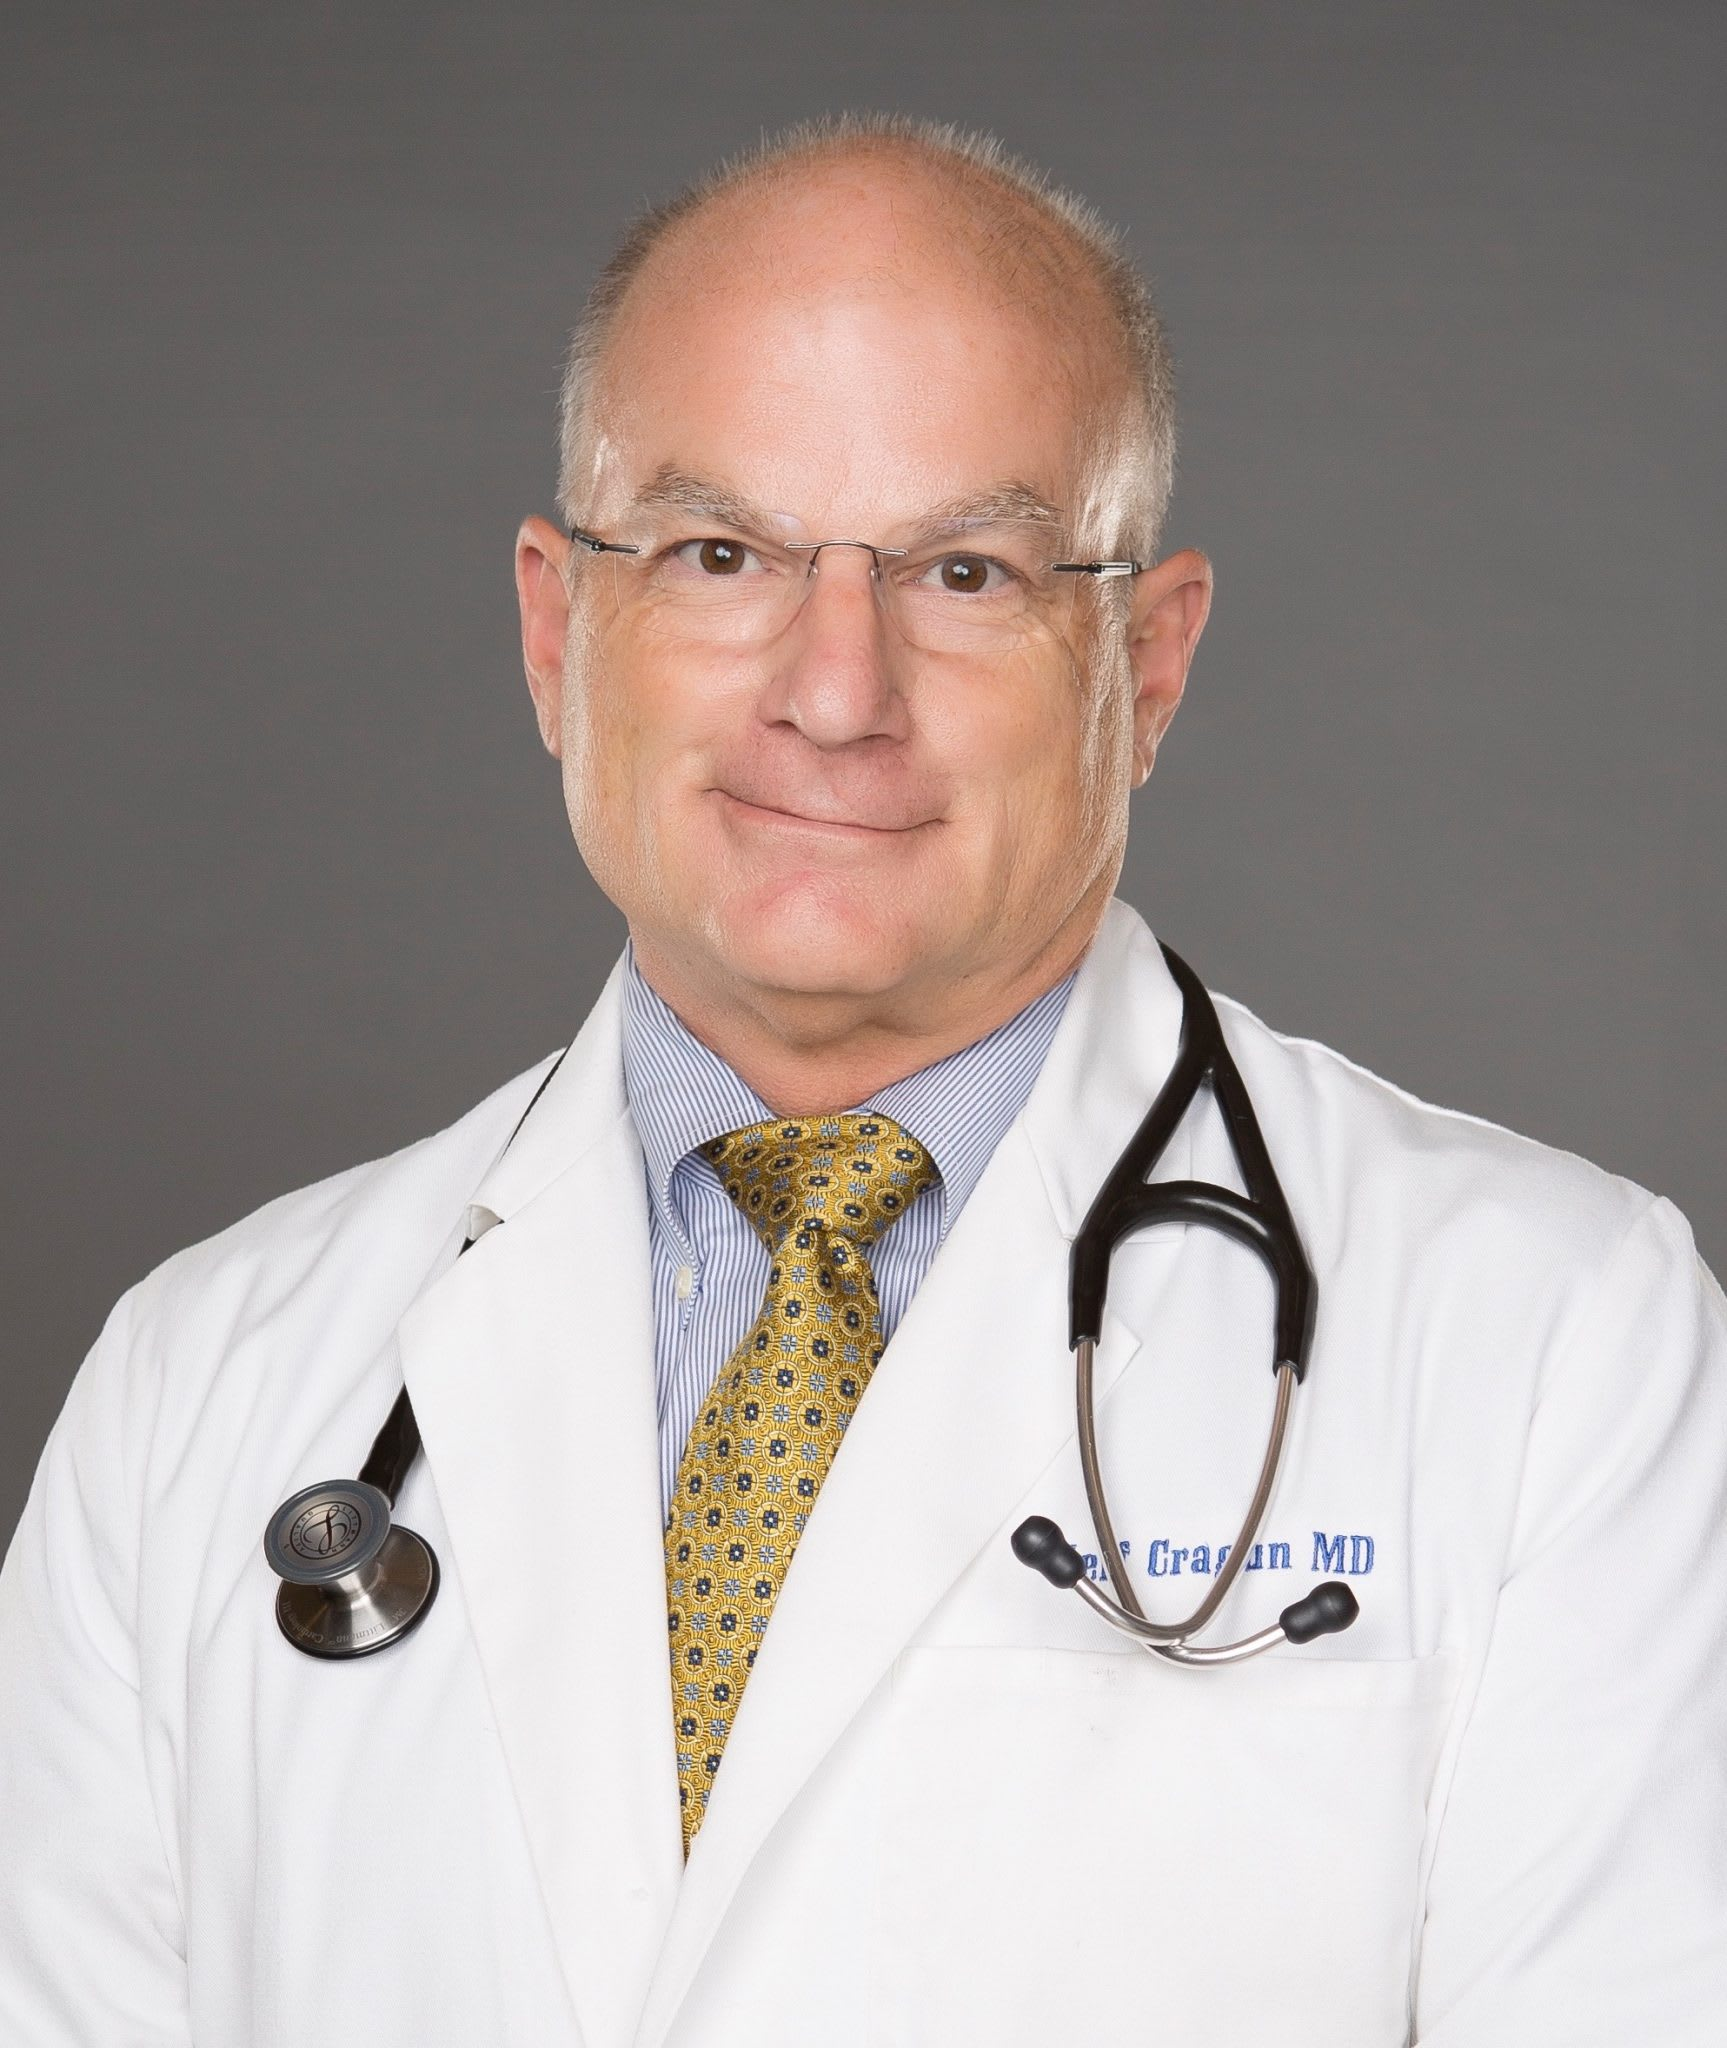 Dr. Jeffrey R Cragun MD